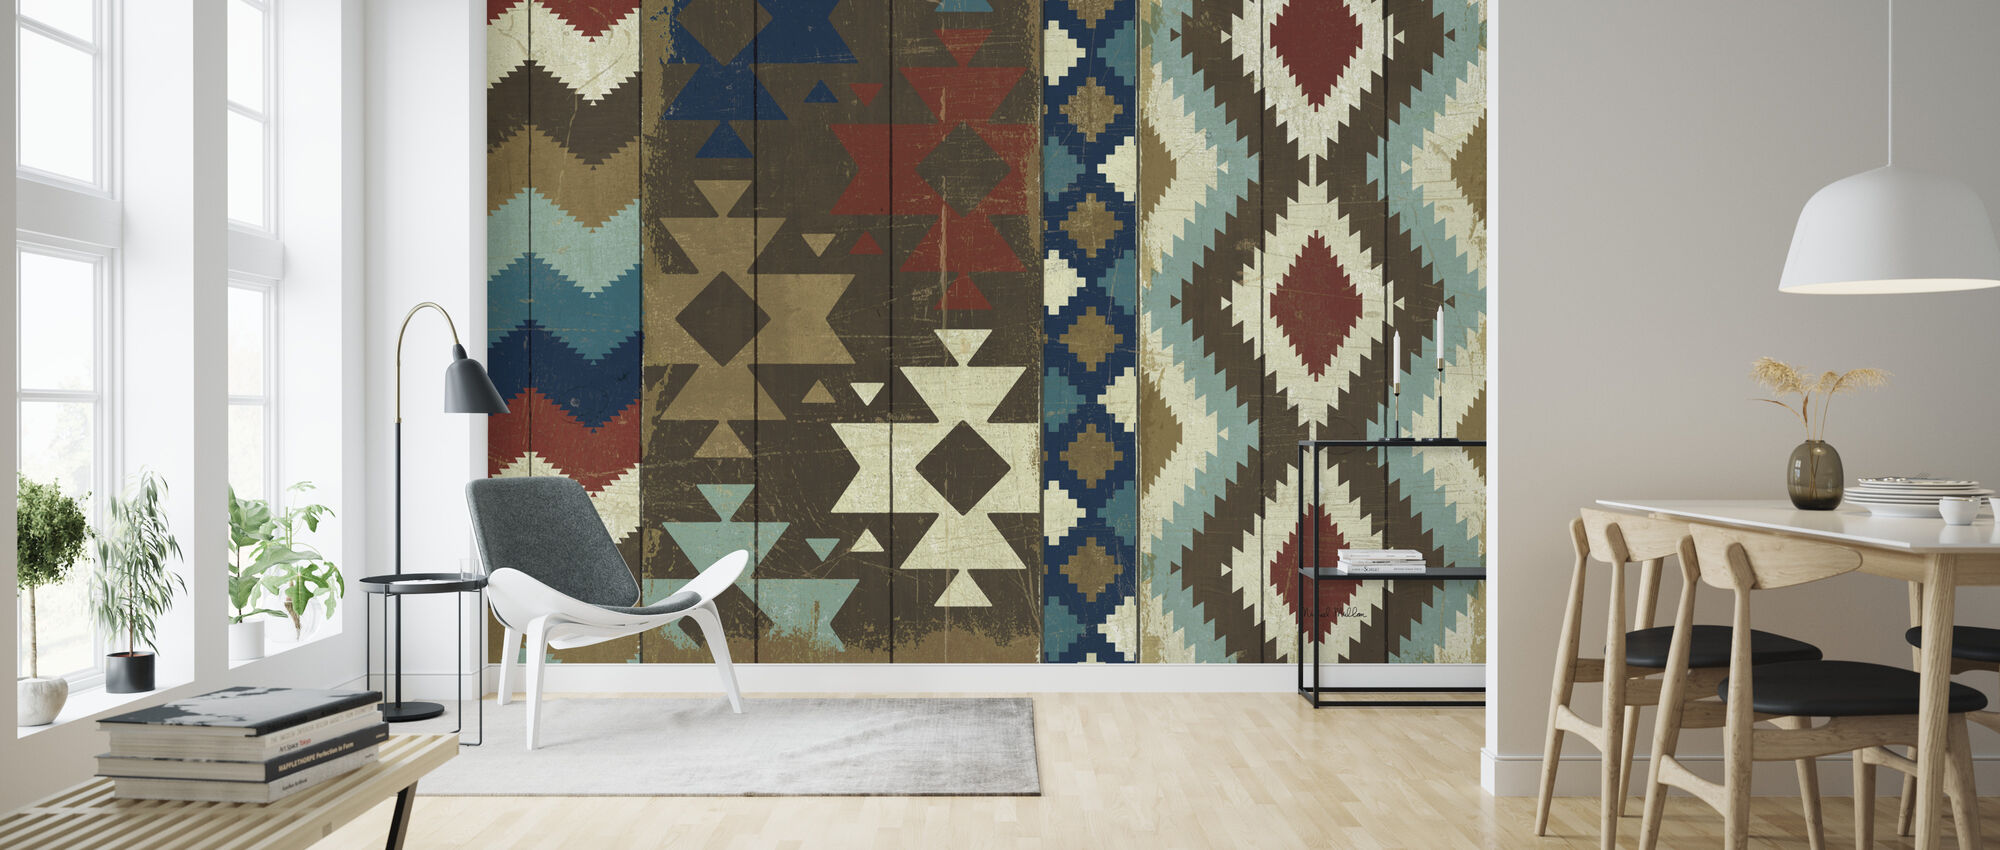 Native Tapestry - Wallpaper - Living Room